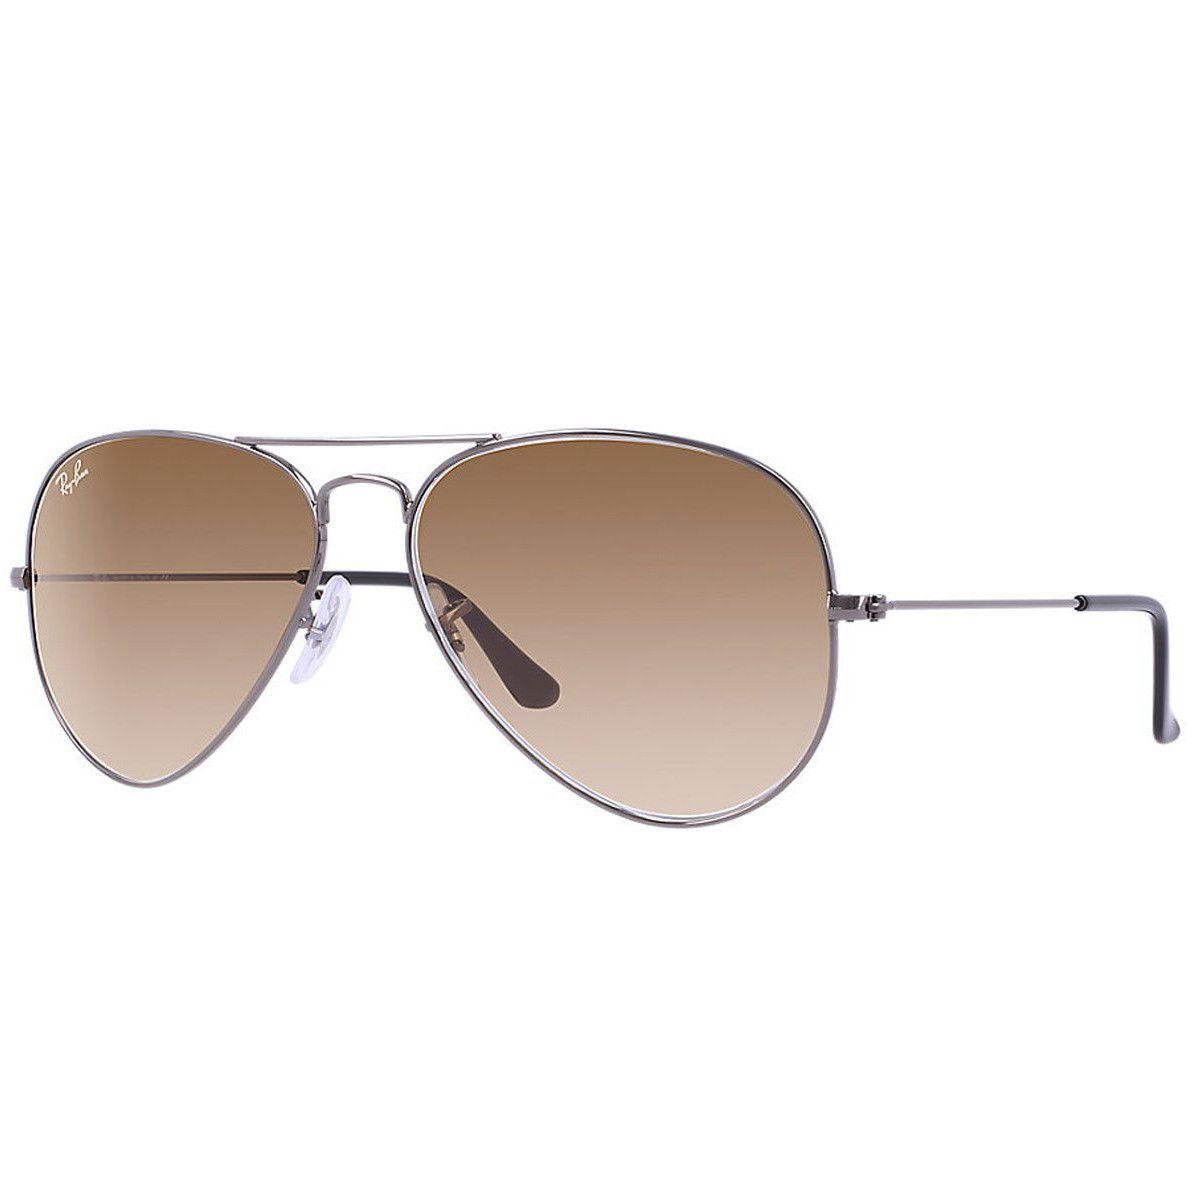 5270b235126e8a Ray-Ban RB 3025 004-51 55 Men s Aviator Gunmetal Metal Frame Light Brown  Gradient Lenses Sunglass